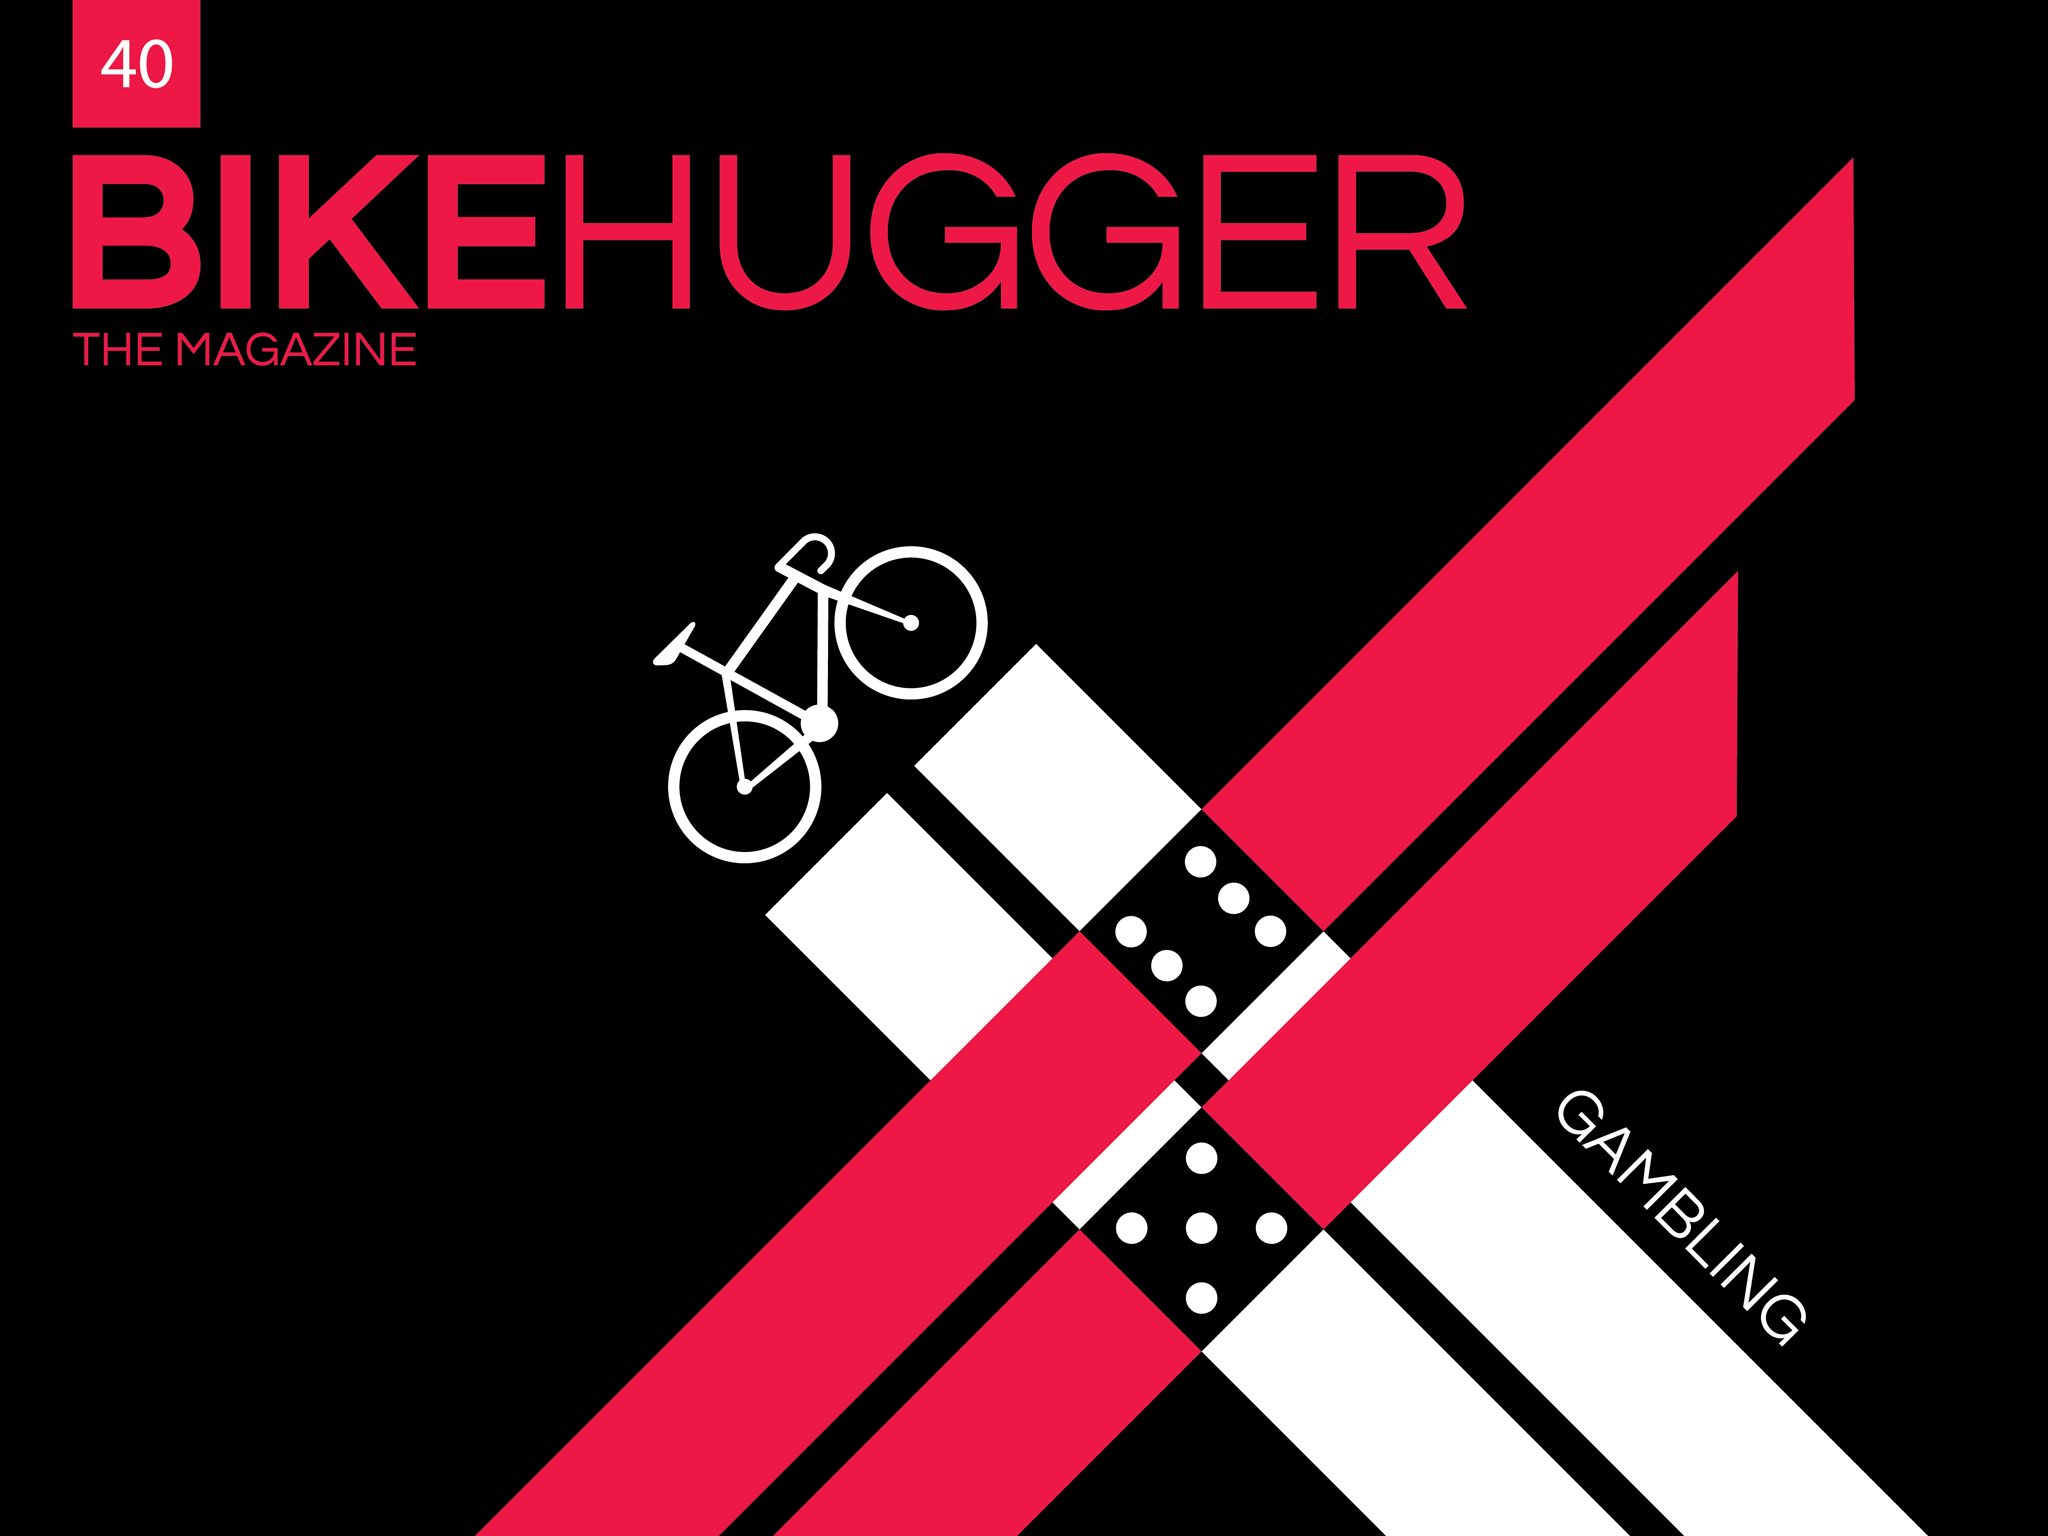 bikehugger_cover_40_ipad_landscape-01